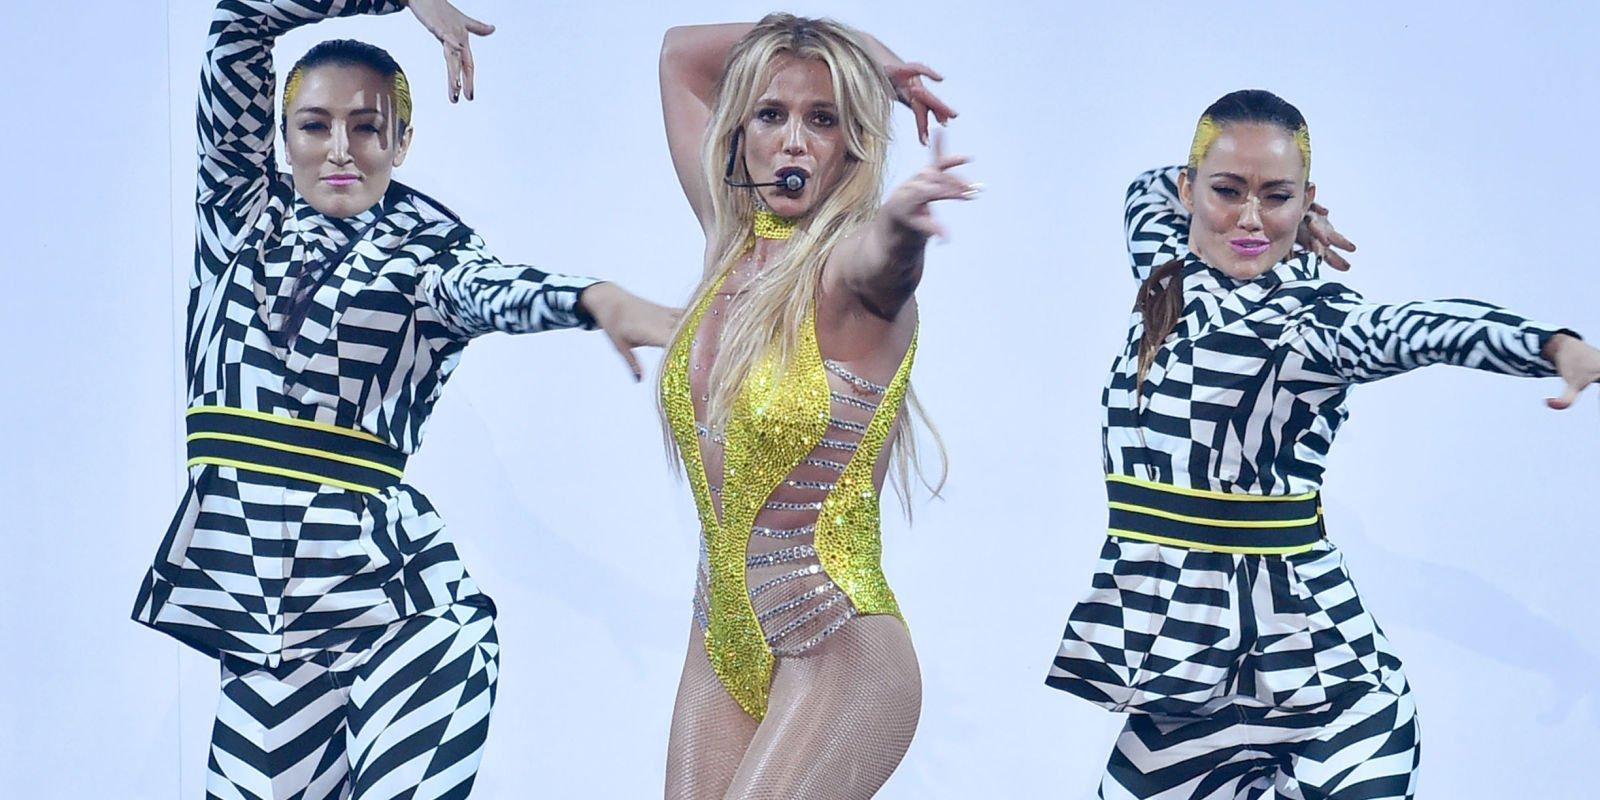 Britney Spears Gave a Wonderful Performance at the VMAs, So Everyone Smile! https://t.co/AtZfXjm4YY #VMAs https://t.co/Jh8ohbcoyu